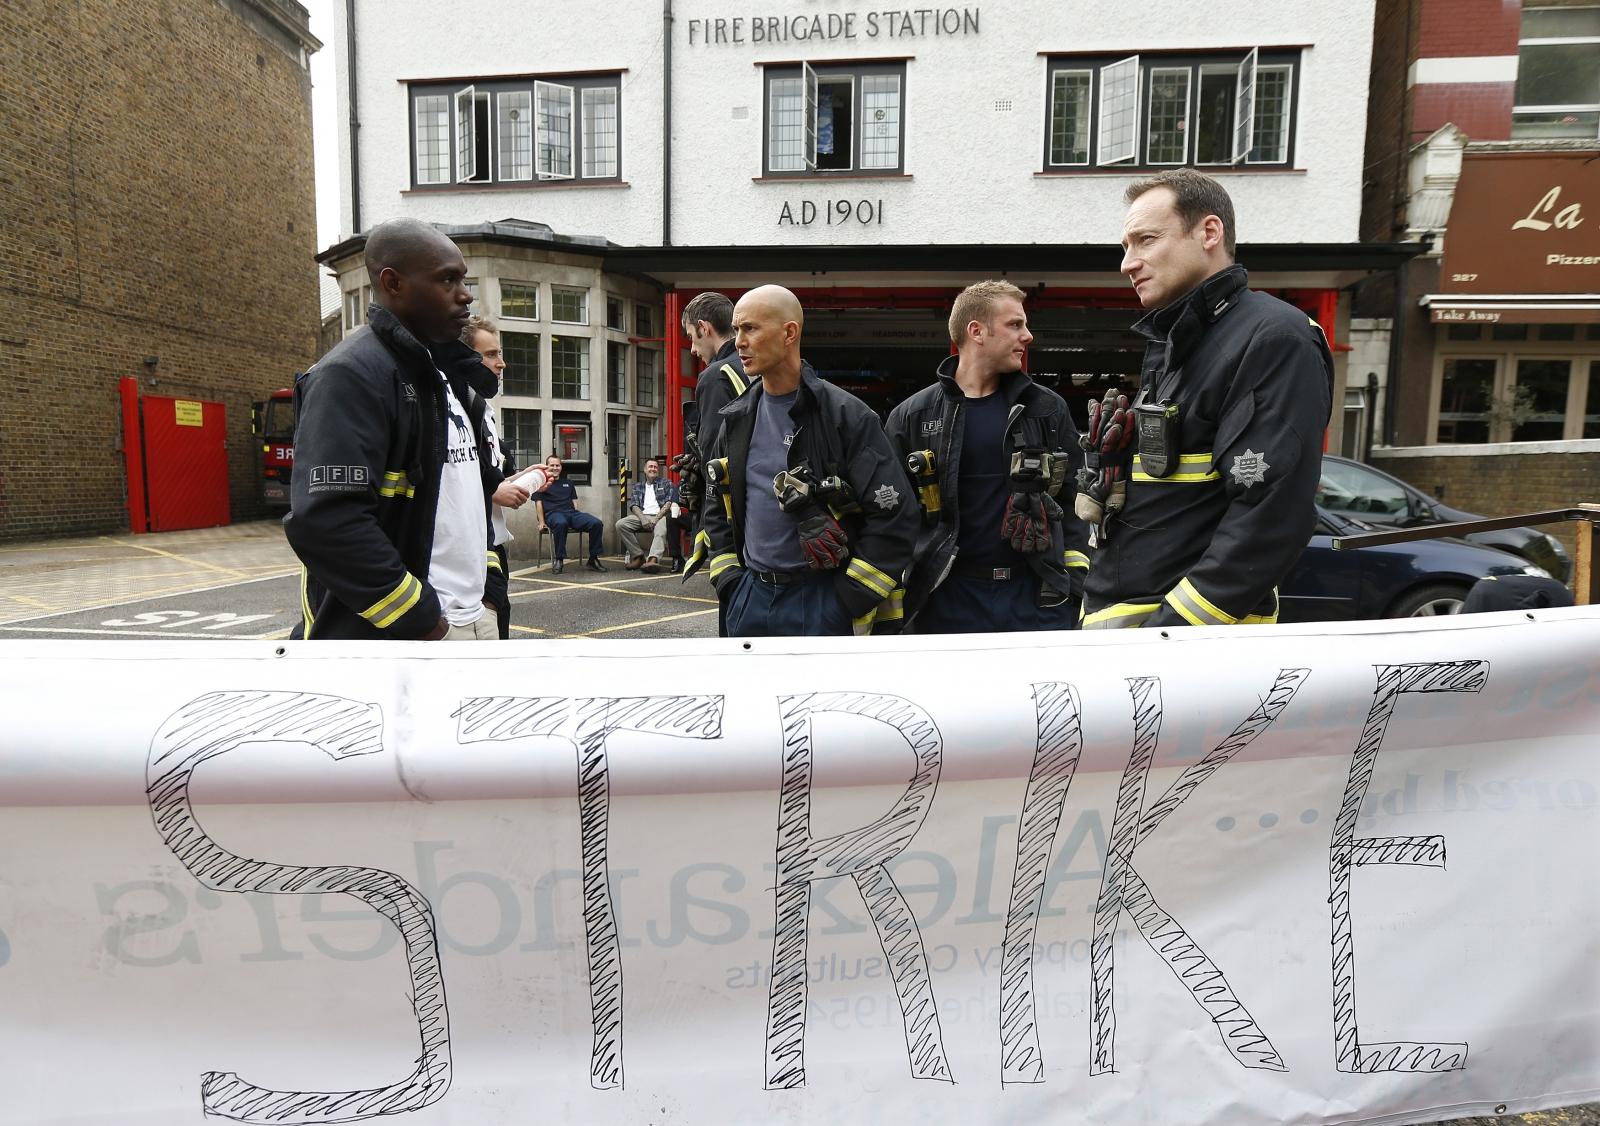 Firefighter Strike